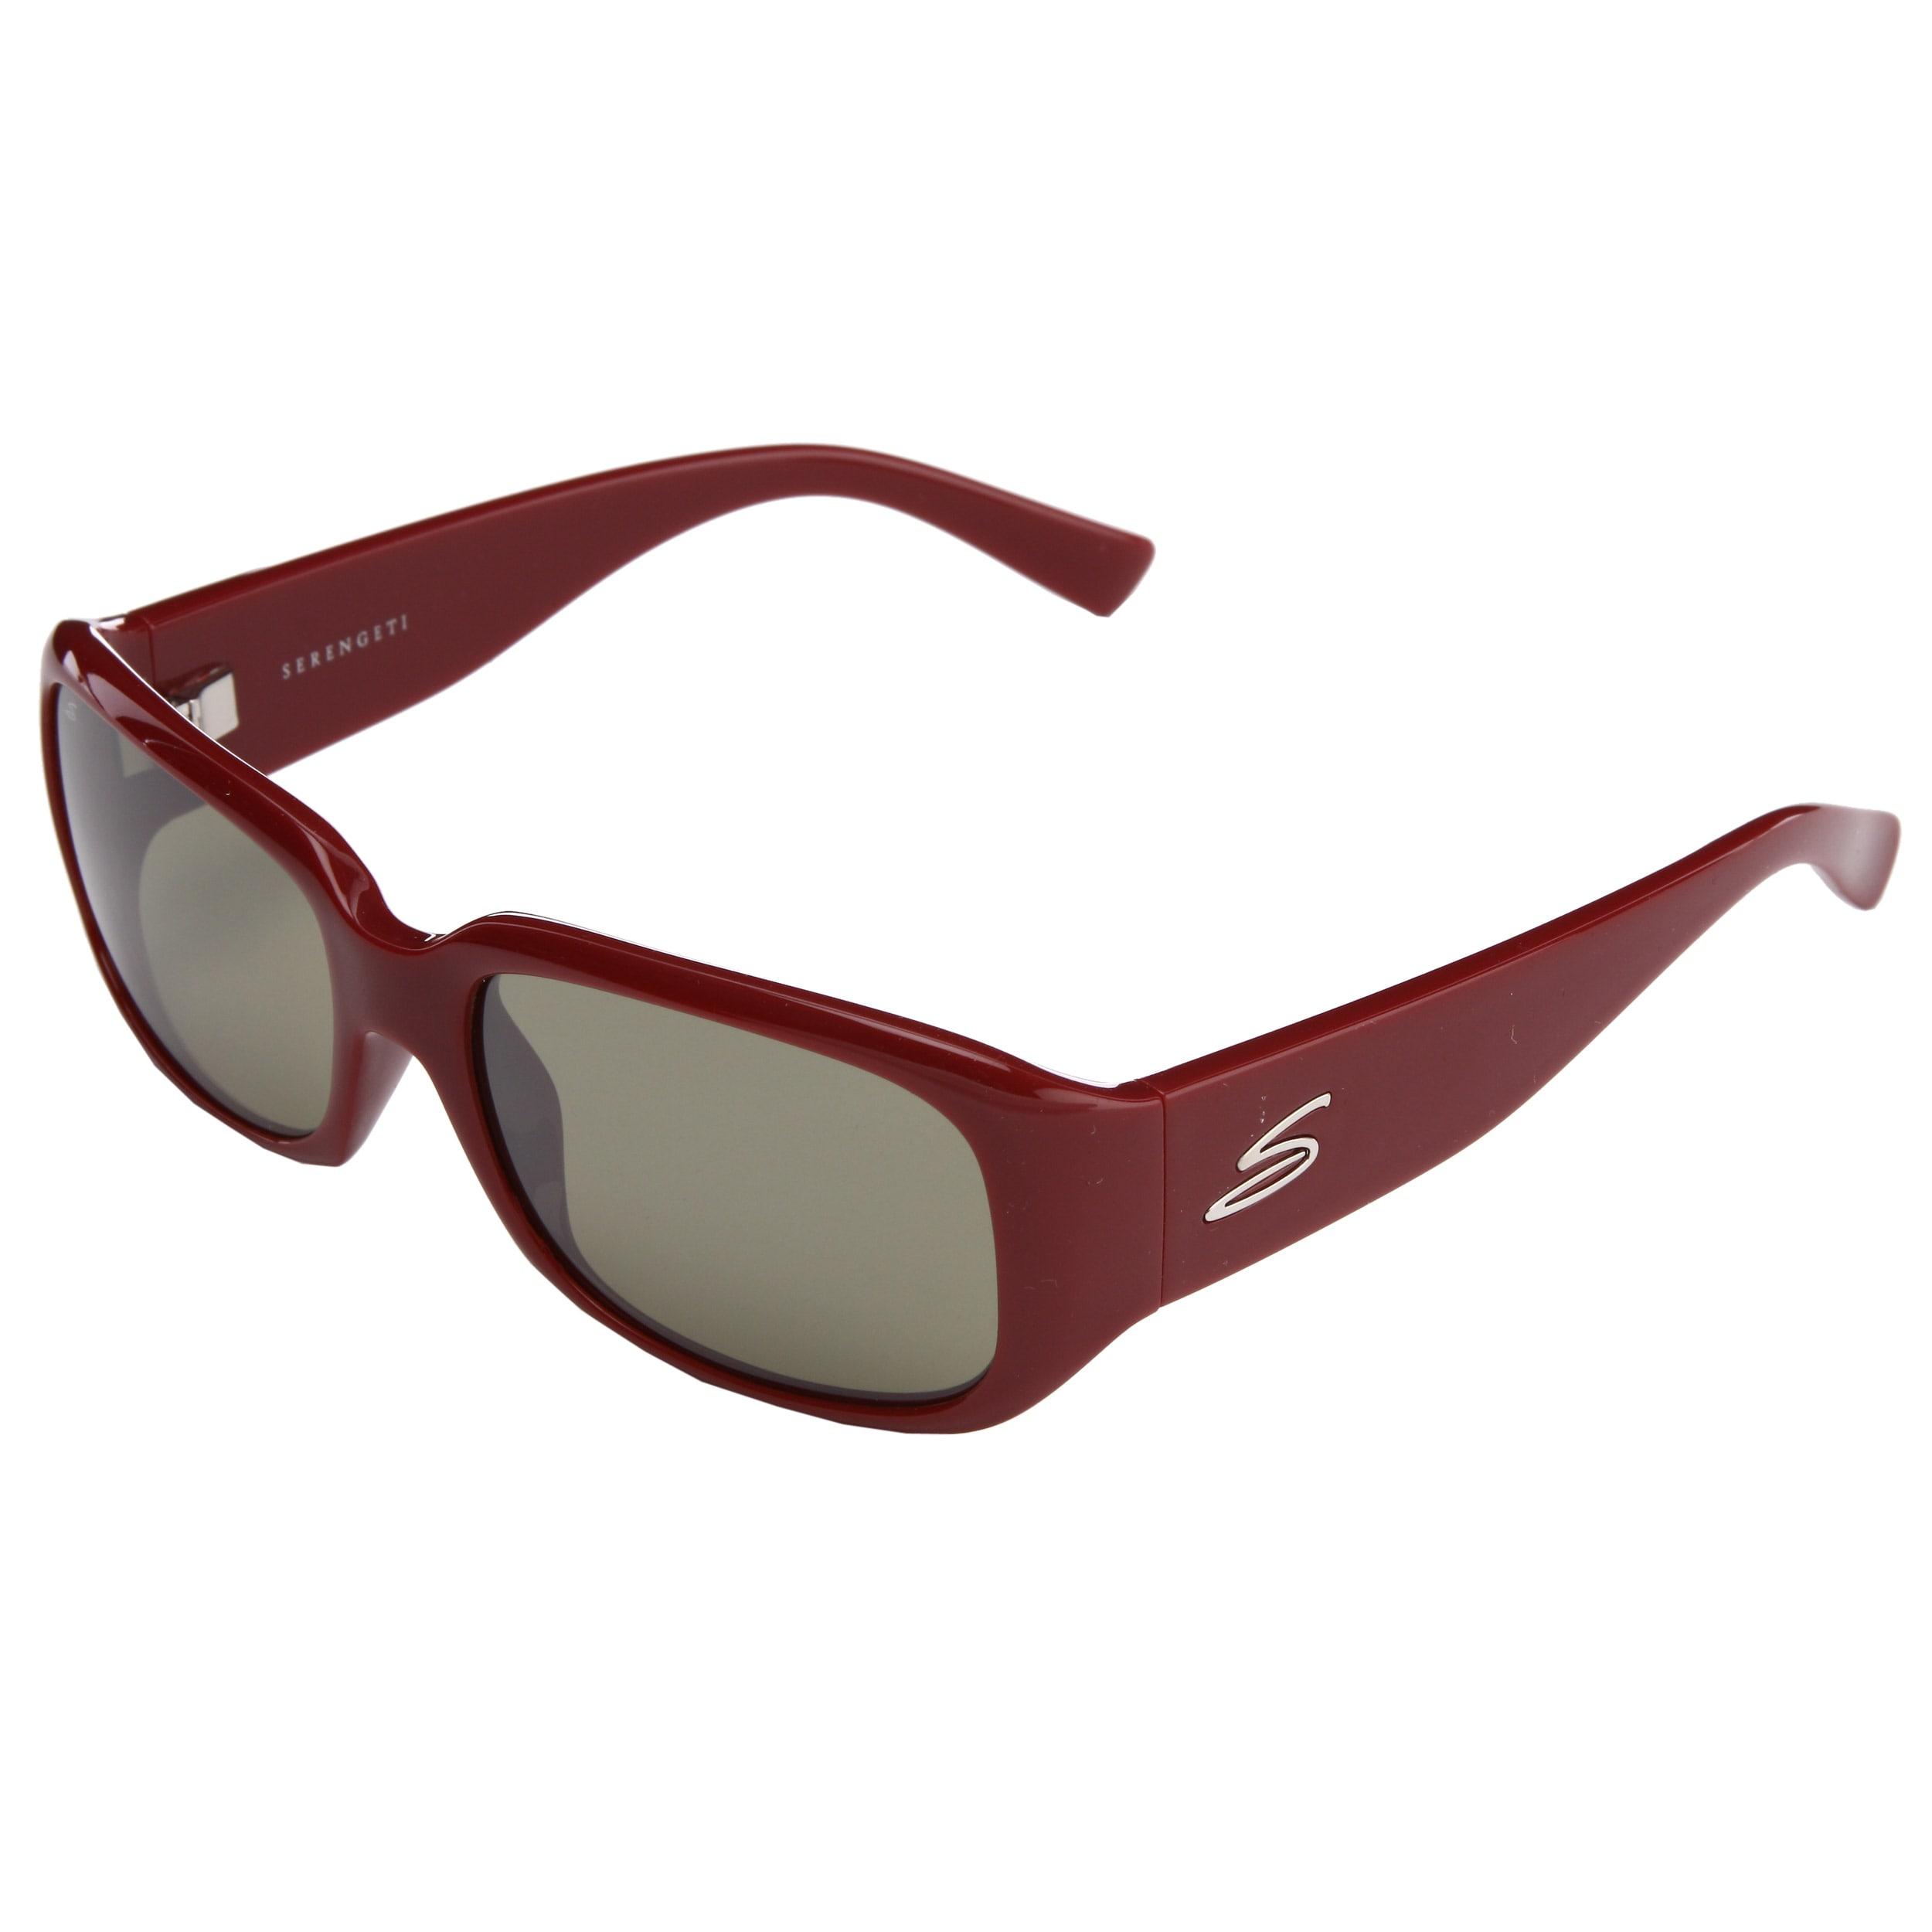 ead0282044 Shop Serengeti Women s  Giuliana  Sunglasses - Ships To Canada - Overstock  - 7232898